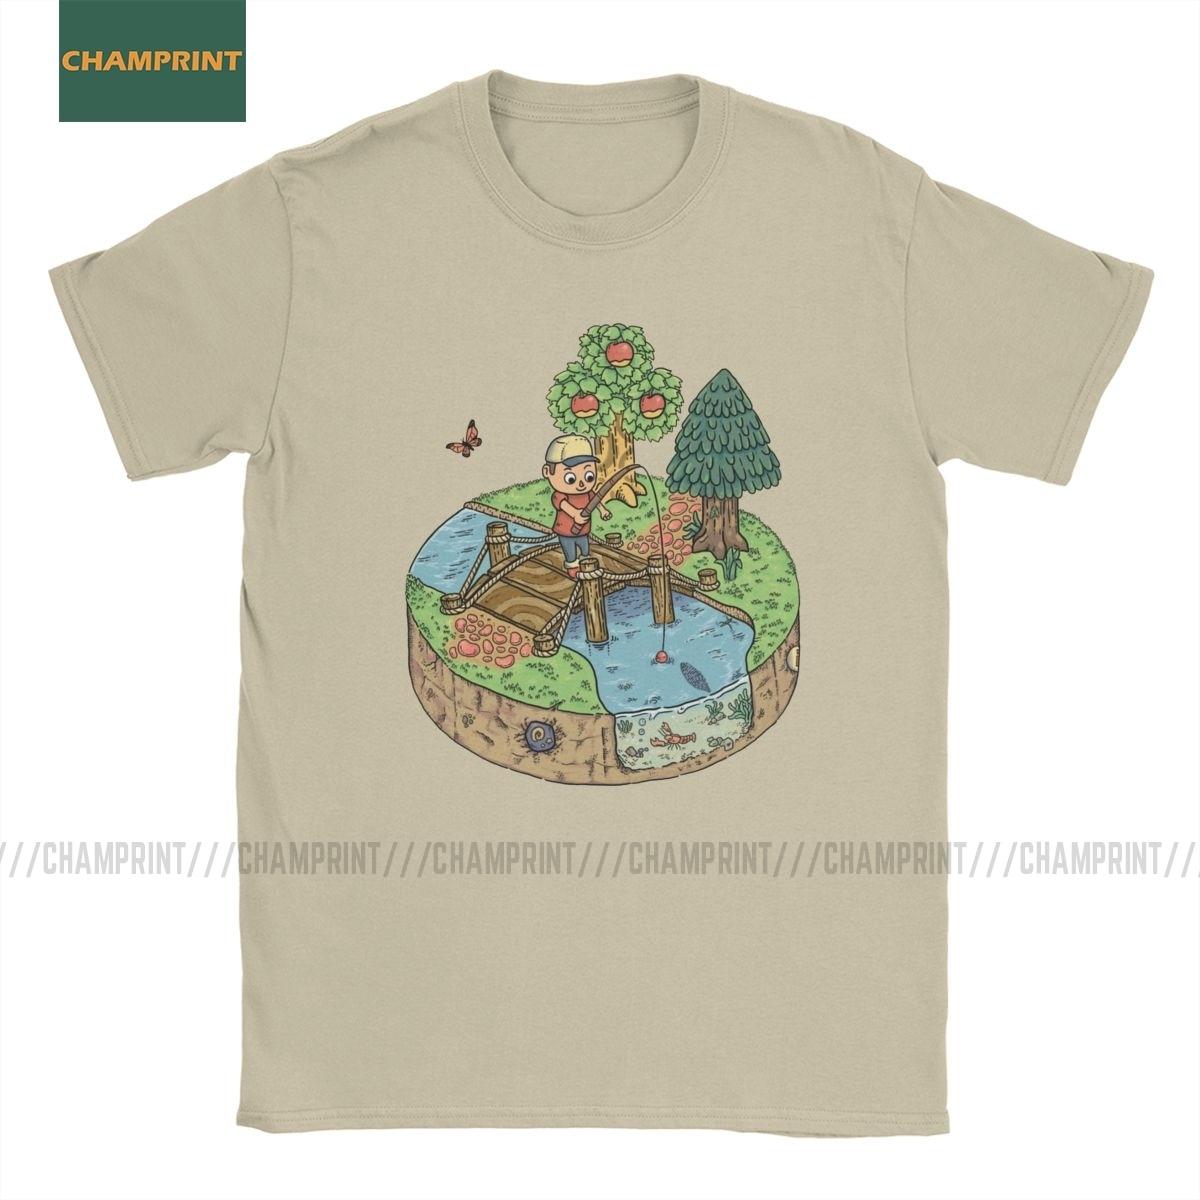 Men's T-Shirts New Leaf Animal Crossing Cotton Tee Shirt Short Sleeve Game Acnl Roost Wild Slider KK T Shirt Round Collar Tops